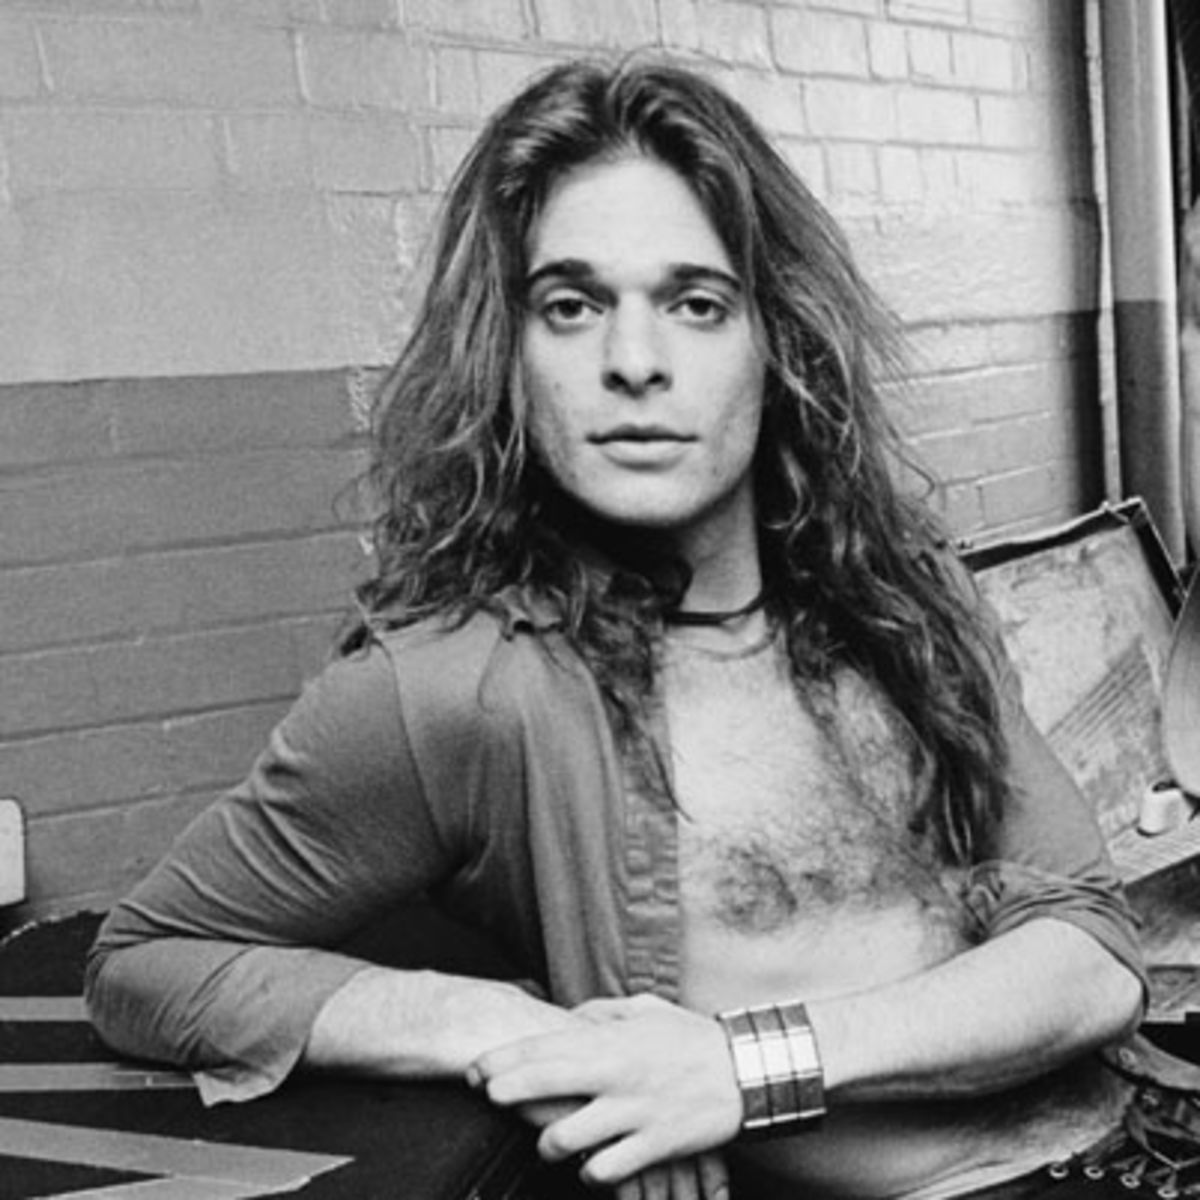 Pin By Stephen J Snyder On Music 4 David Lee Roth David Lee Van Halen